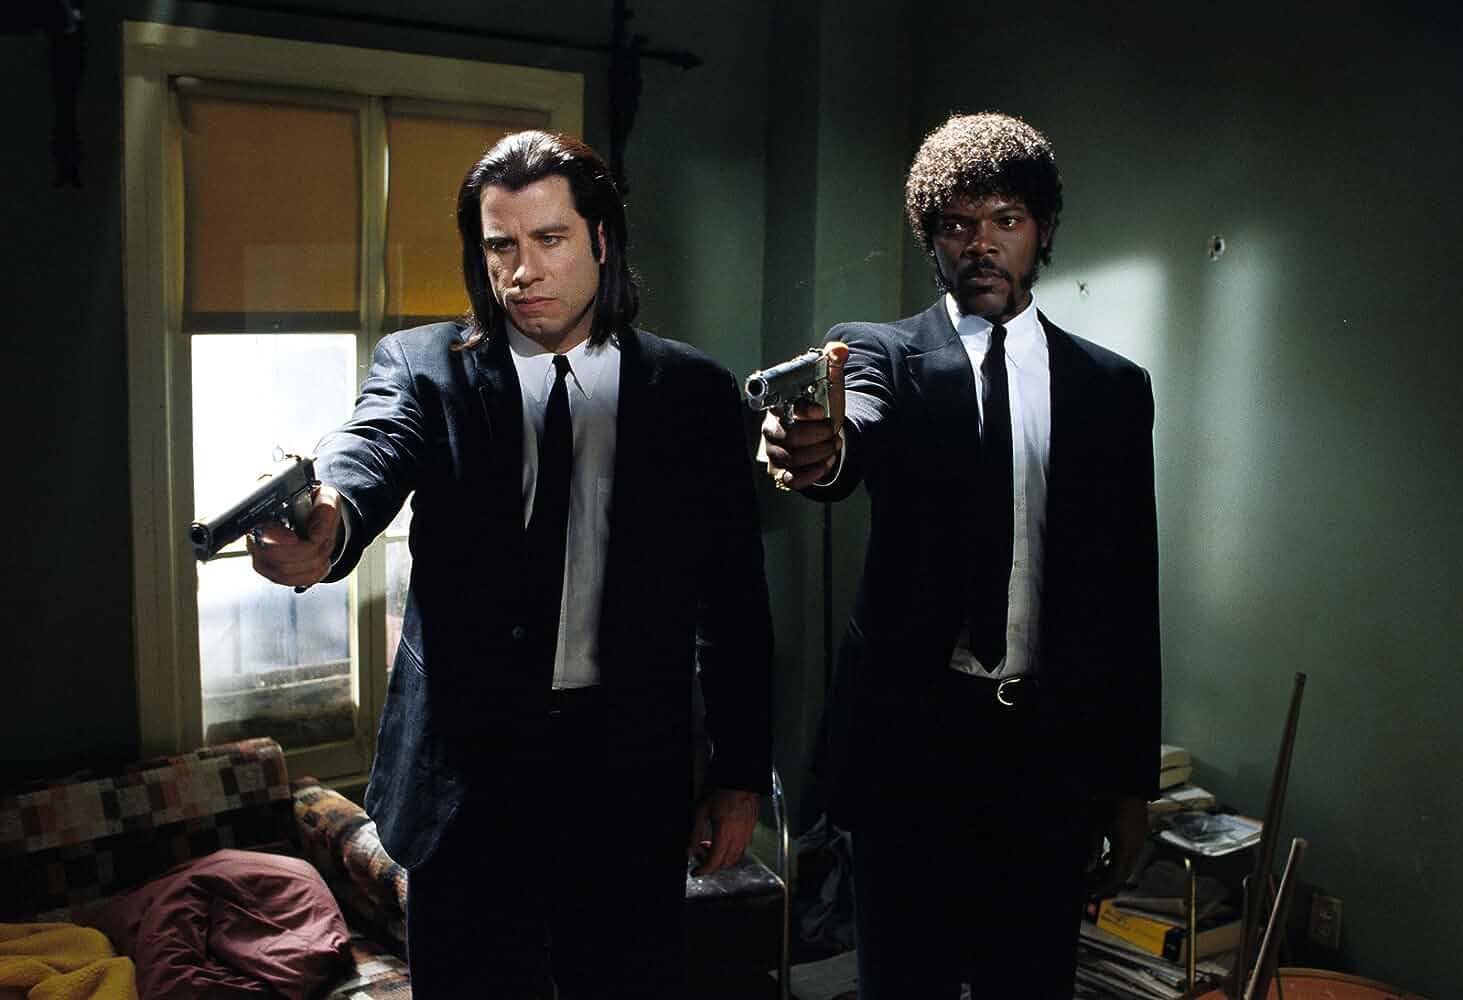 Samuel L Jackson and John Travolta in Pulp Fiction 1994